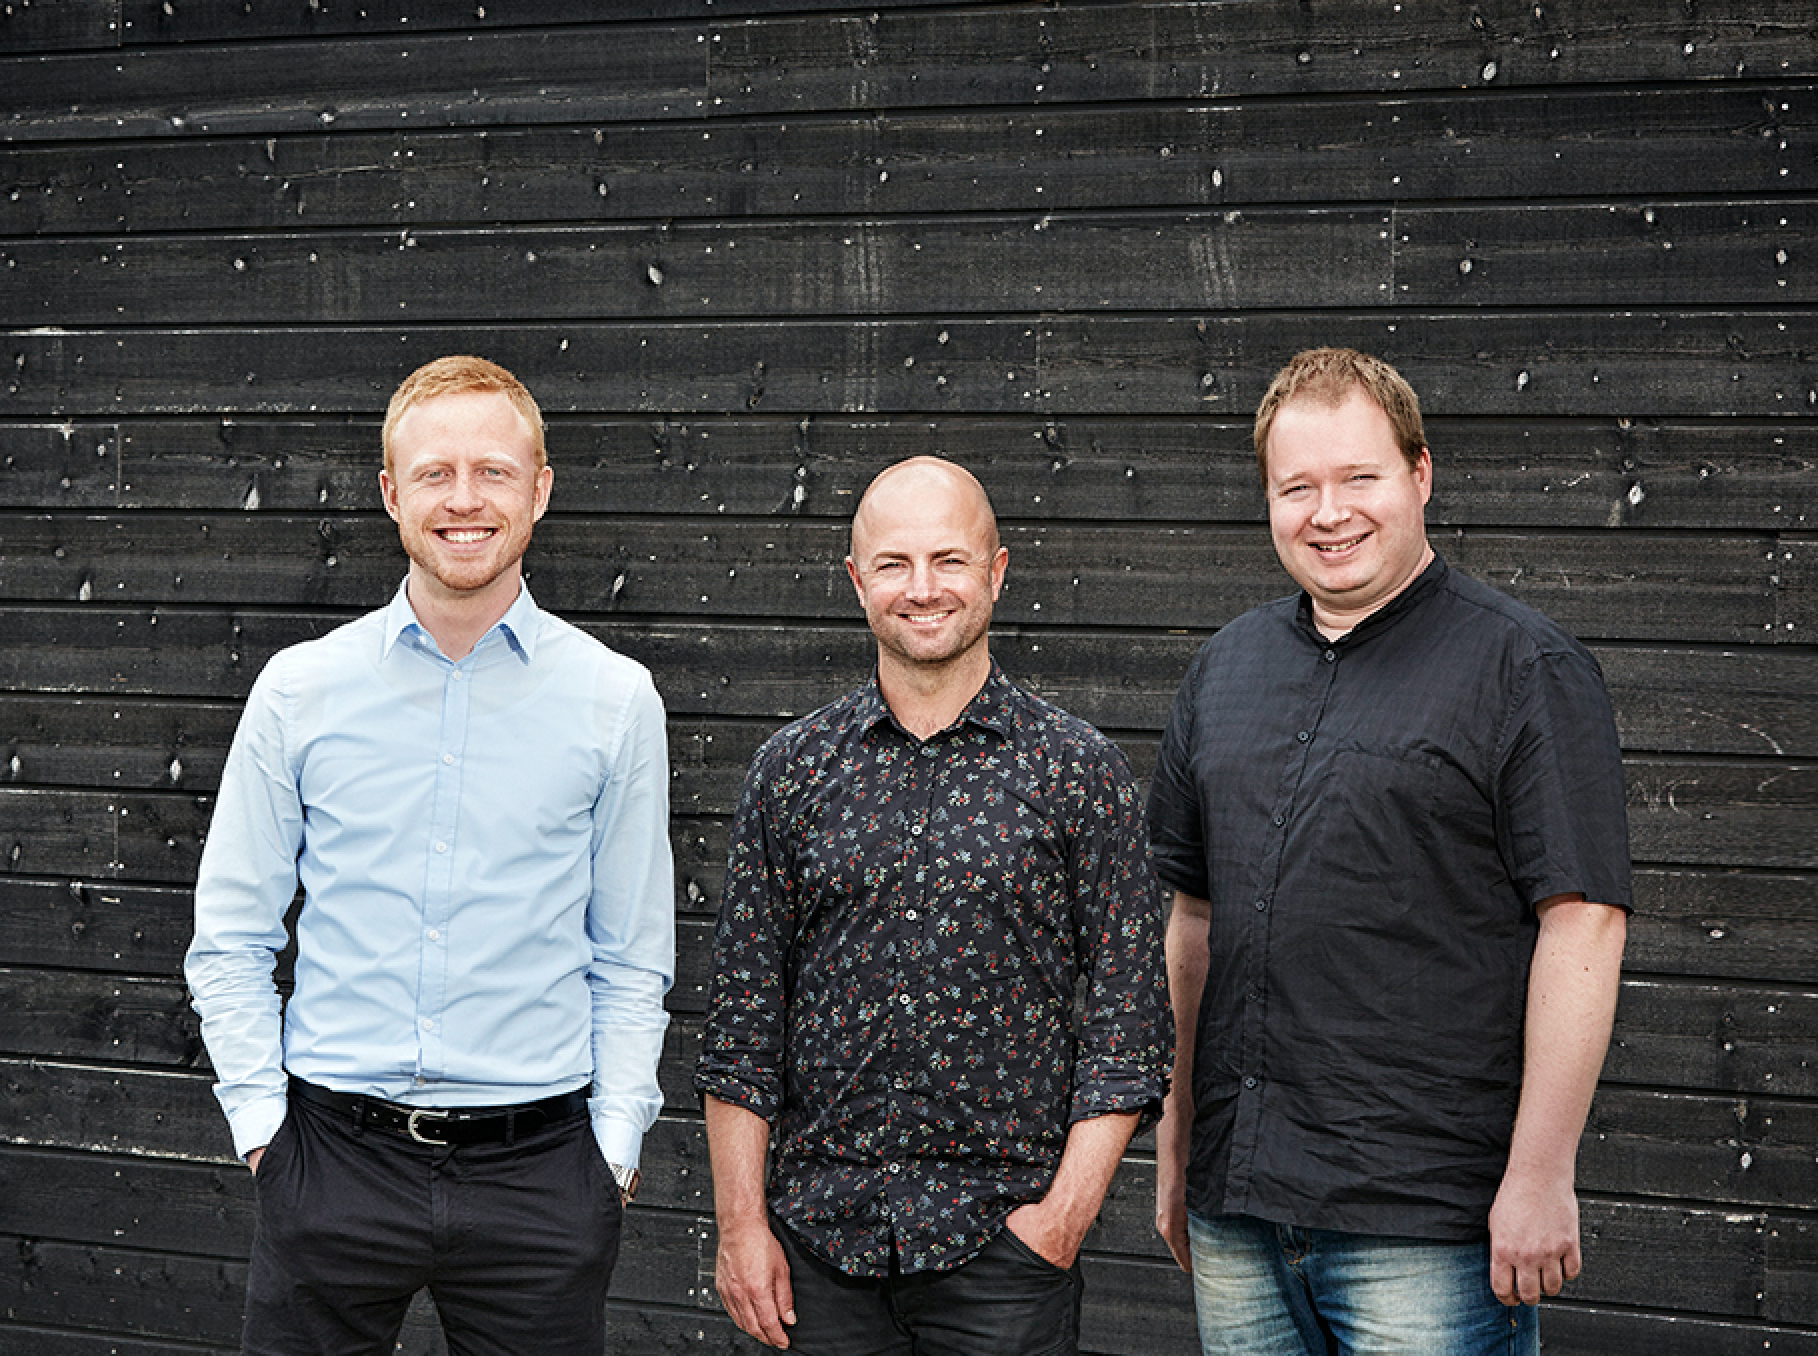 Team Skjoldby